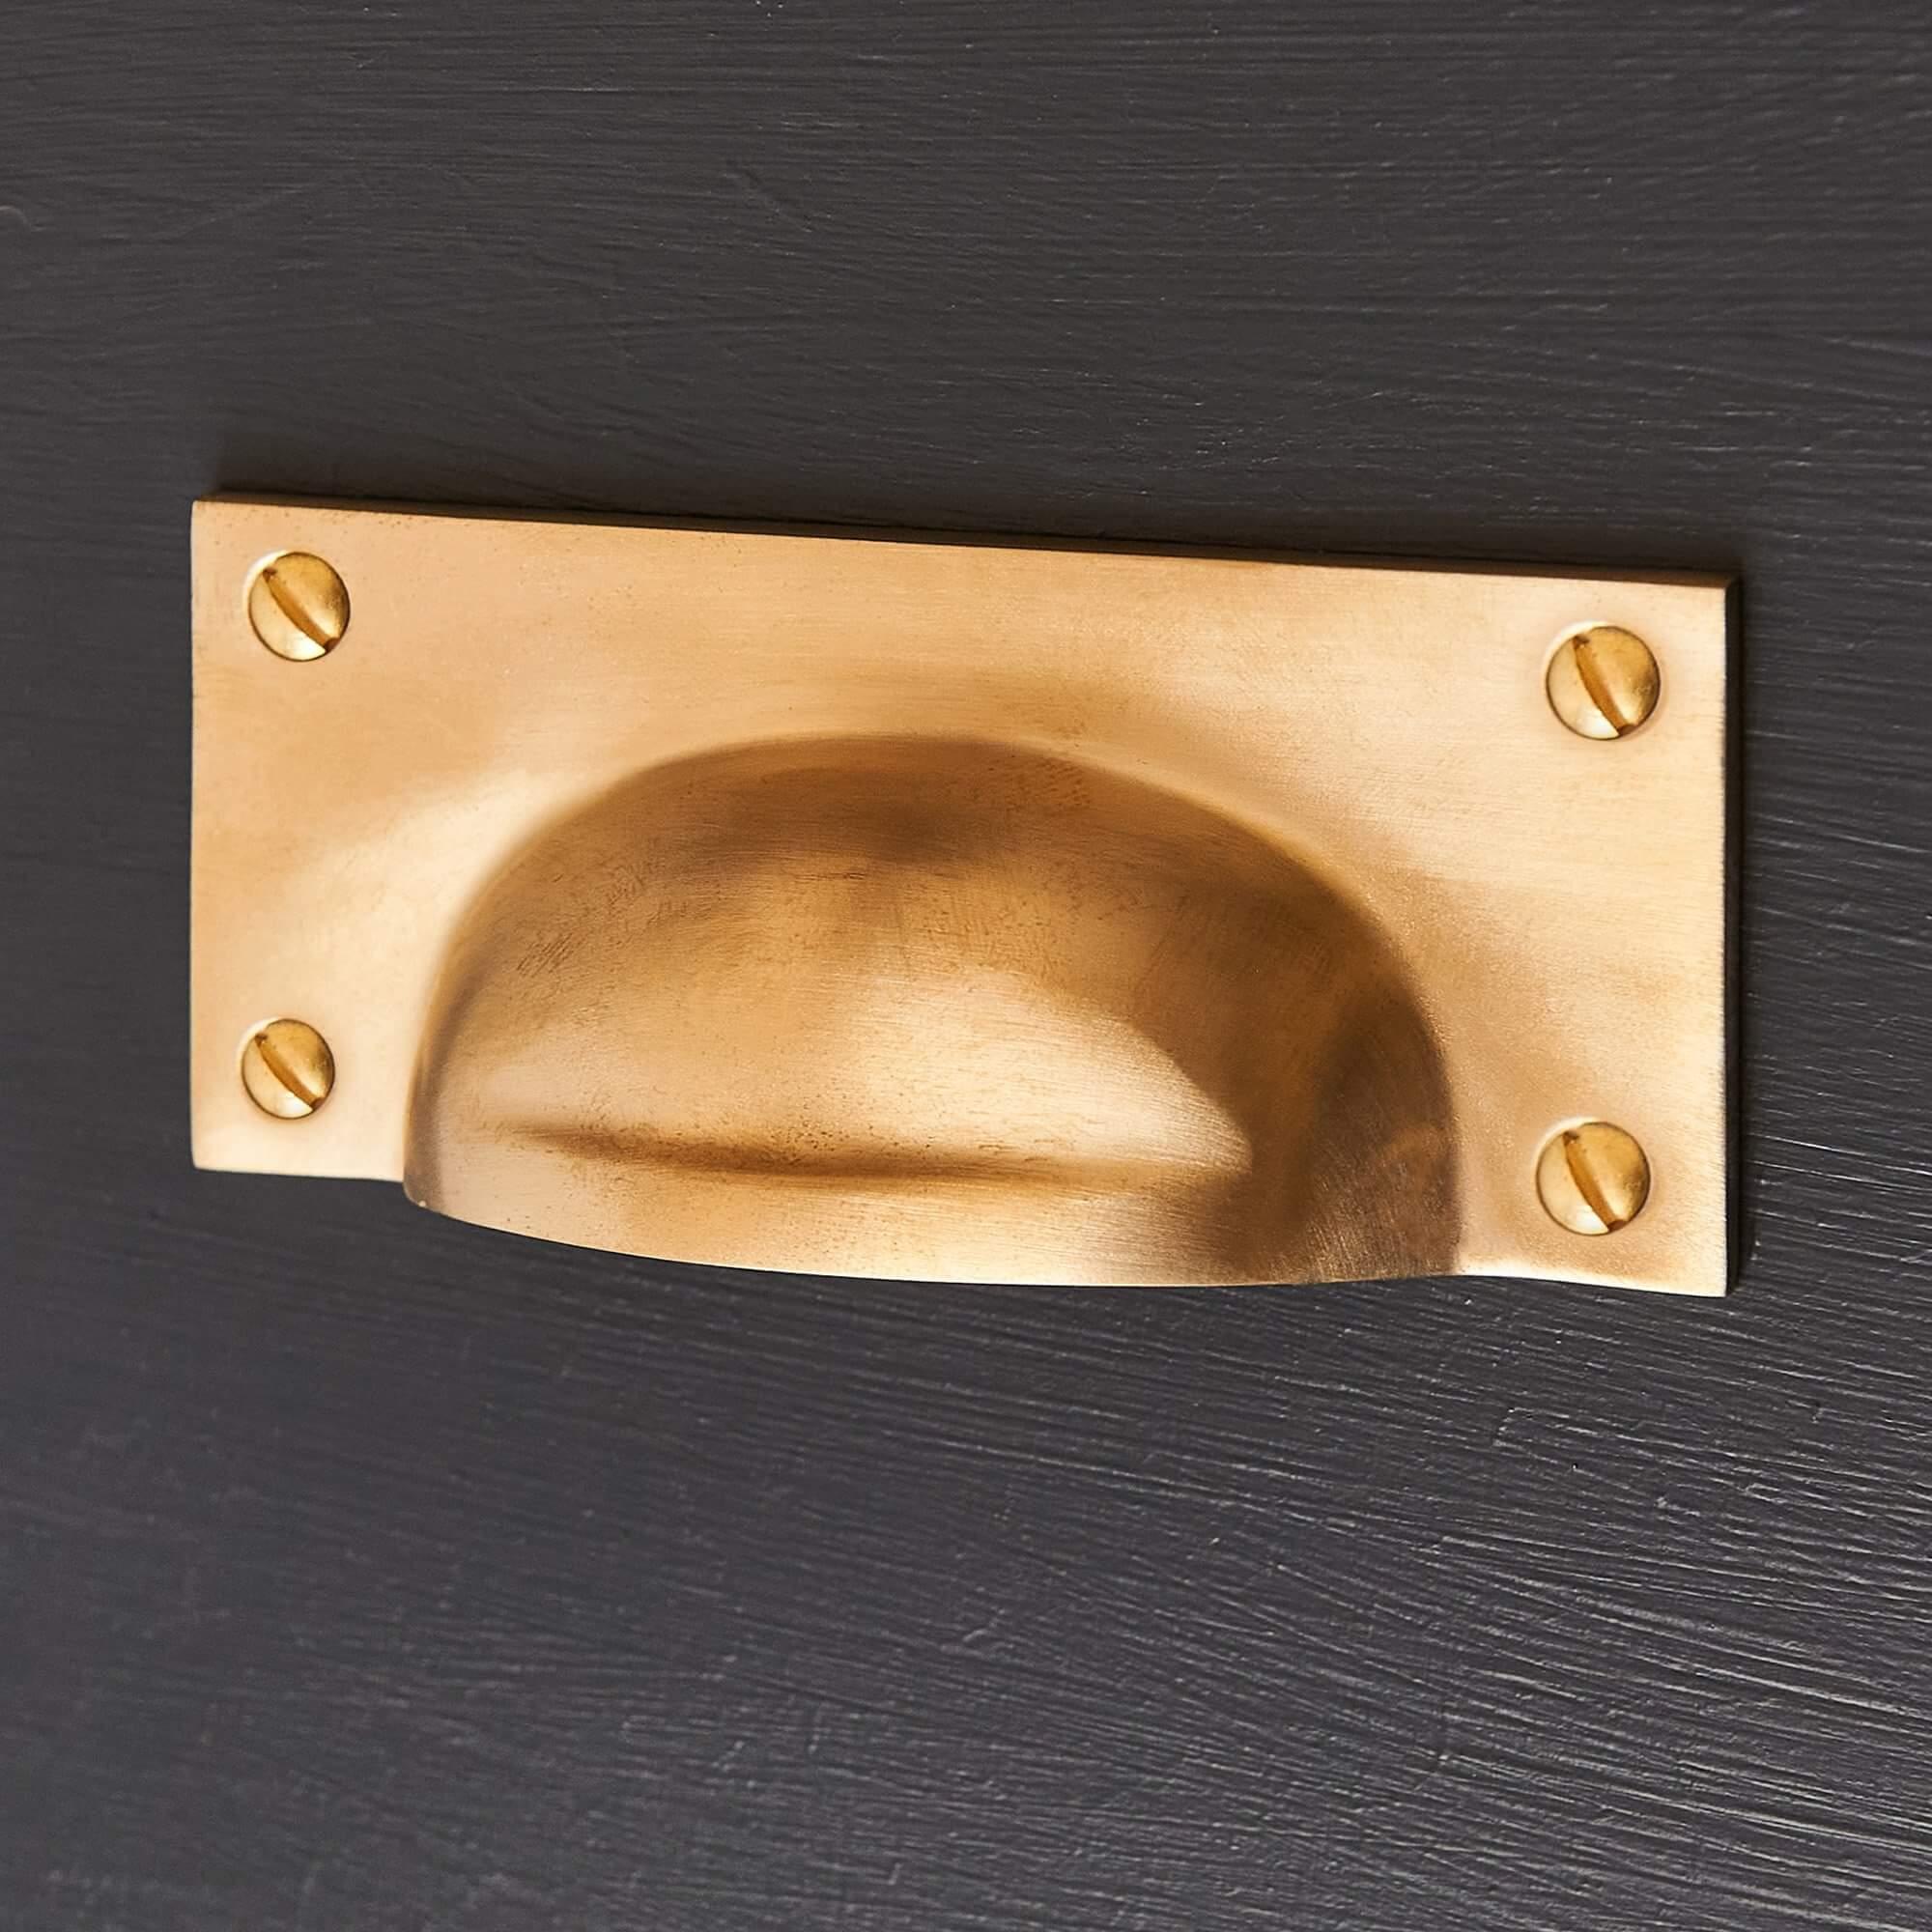 Cast Drawer Pull (Large) - Satin Brass